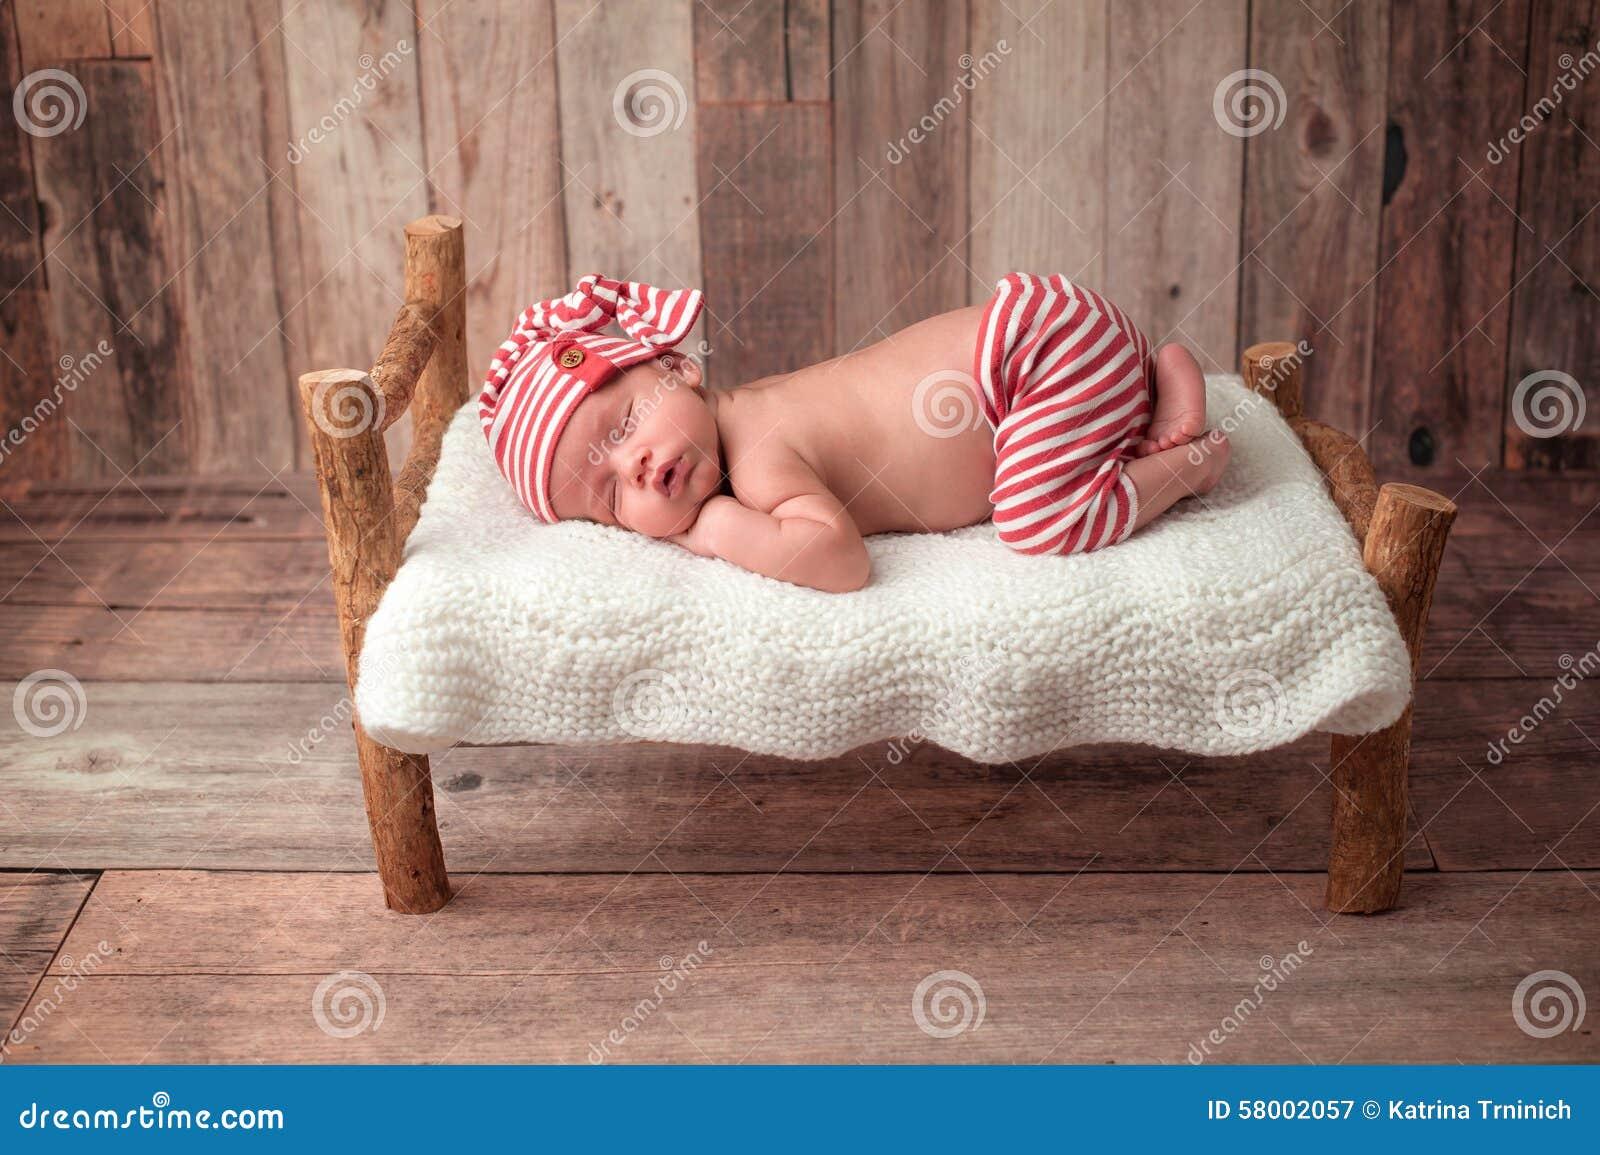 Tiny Bed newborn baby boy sleeping on a tiny bed stock photo - image: 58002057